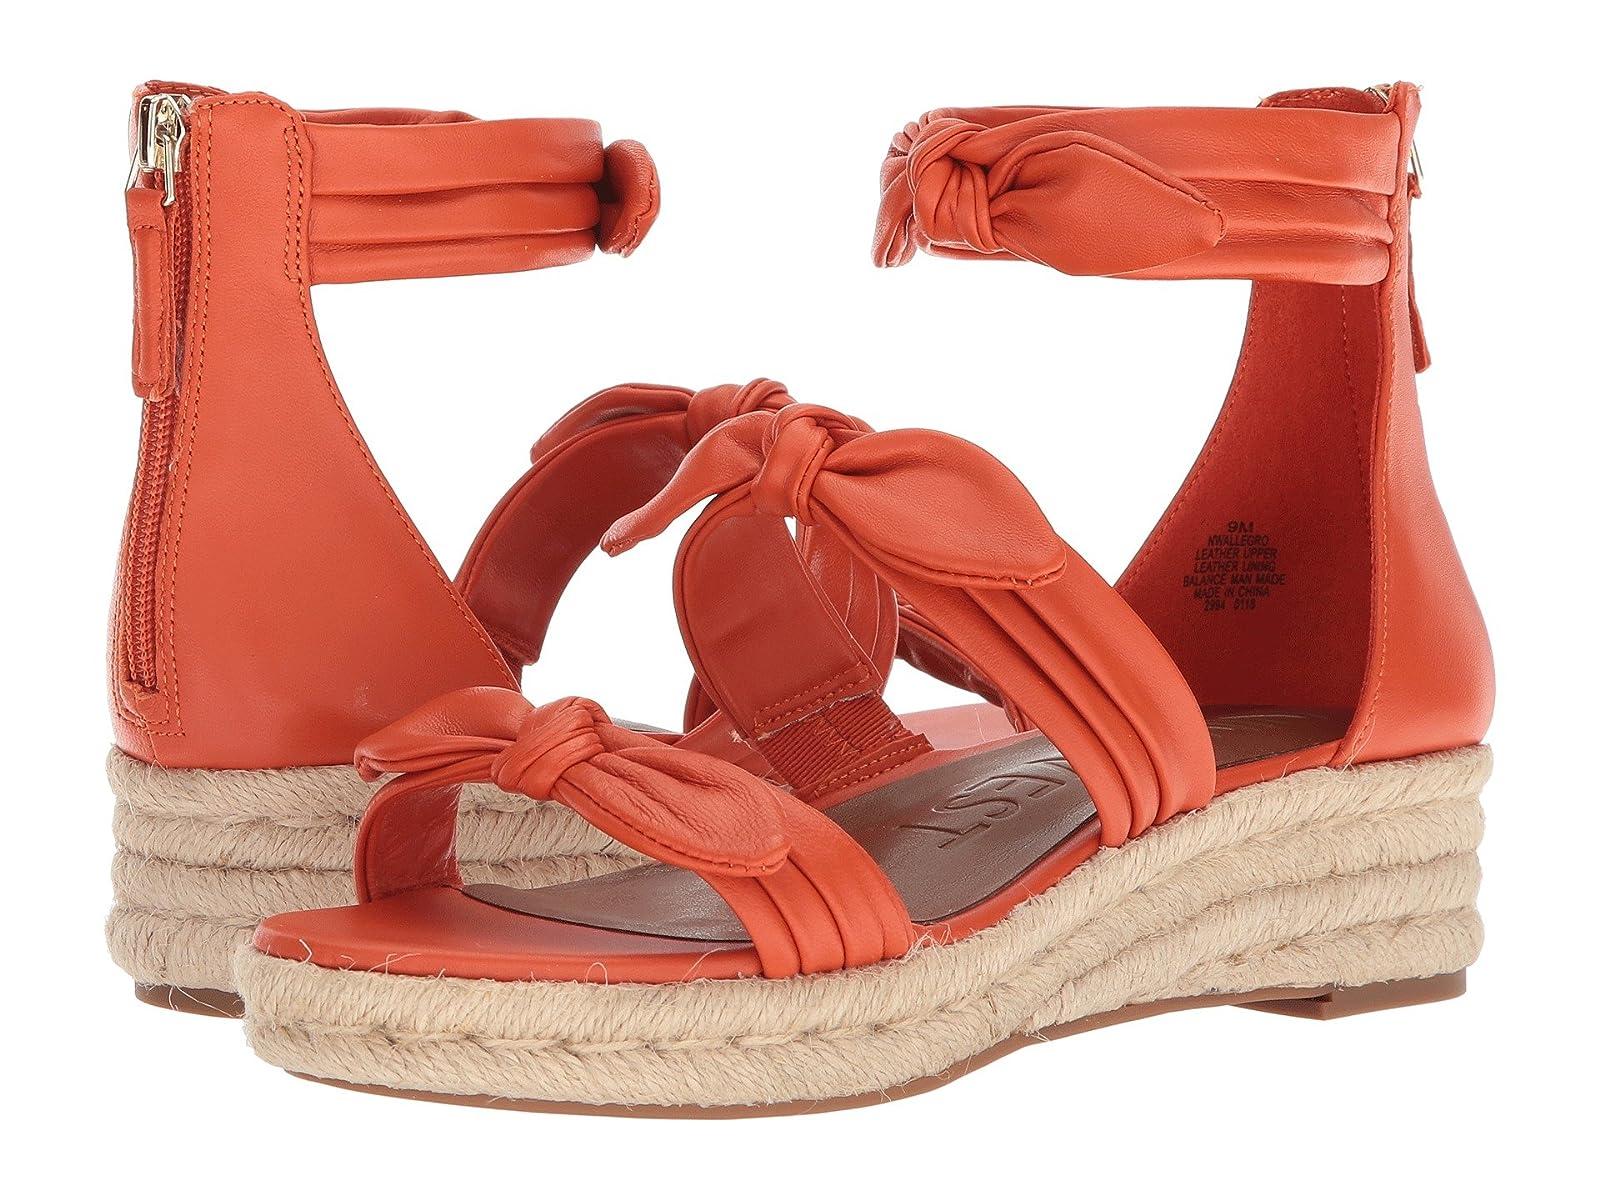 Nine West Allegro Espadrille Wedge SandalCheap and distinctive eye-catching shoes